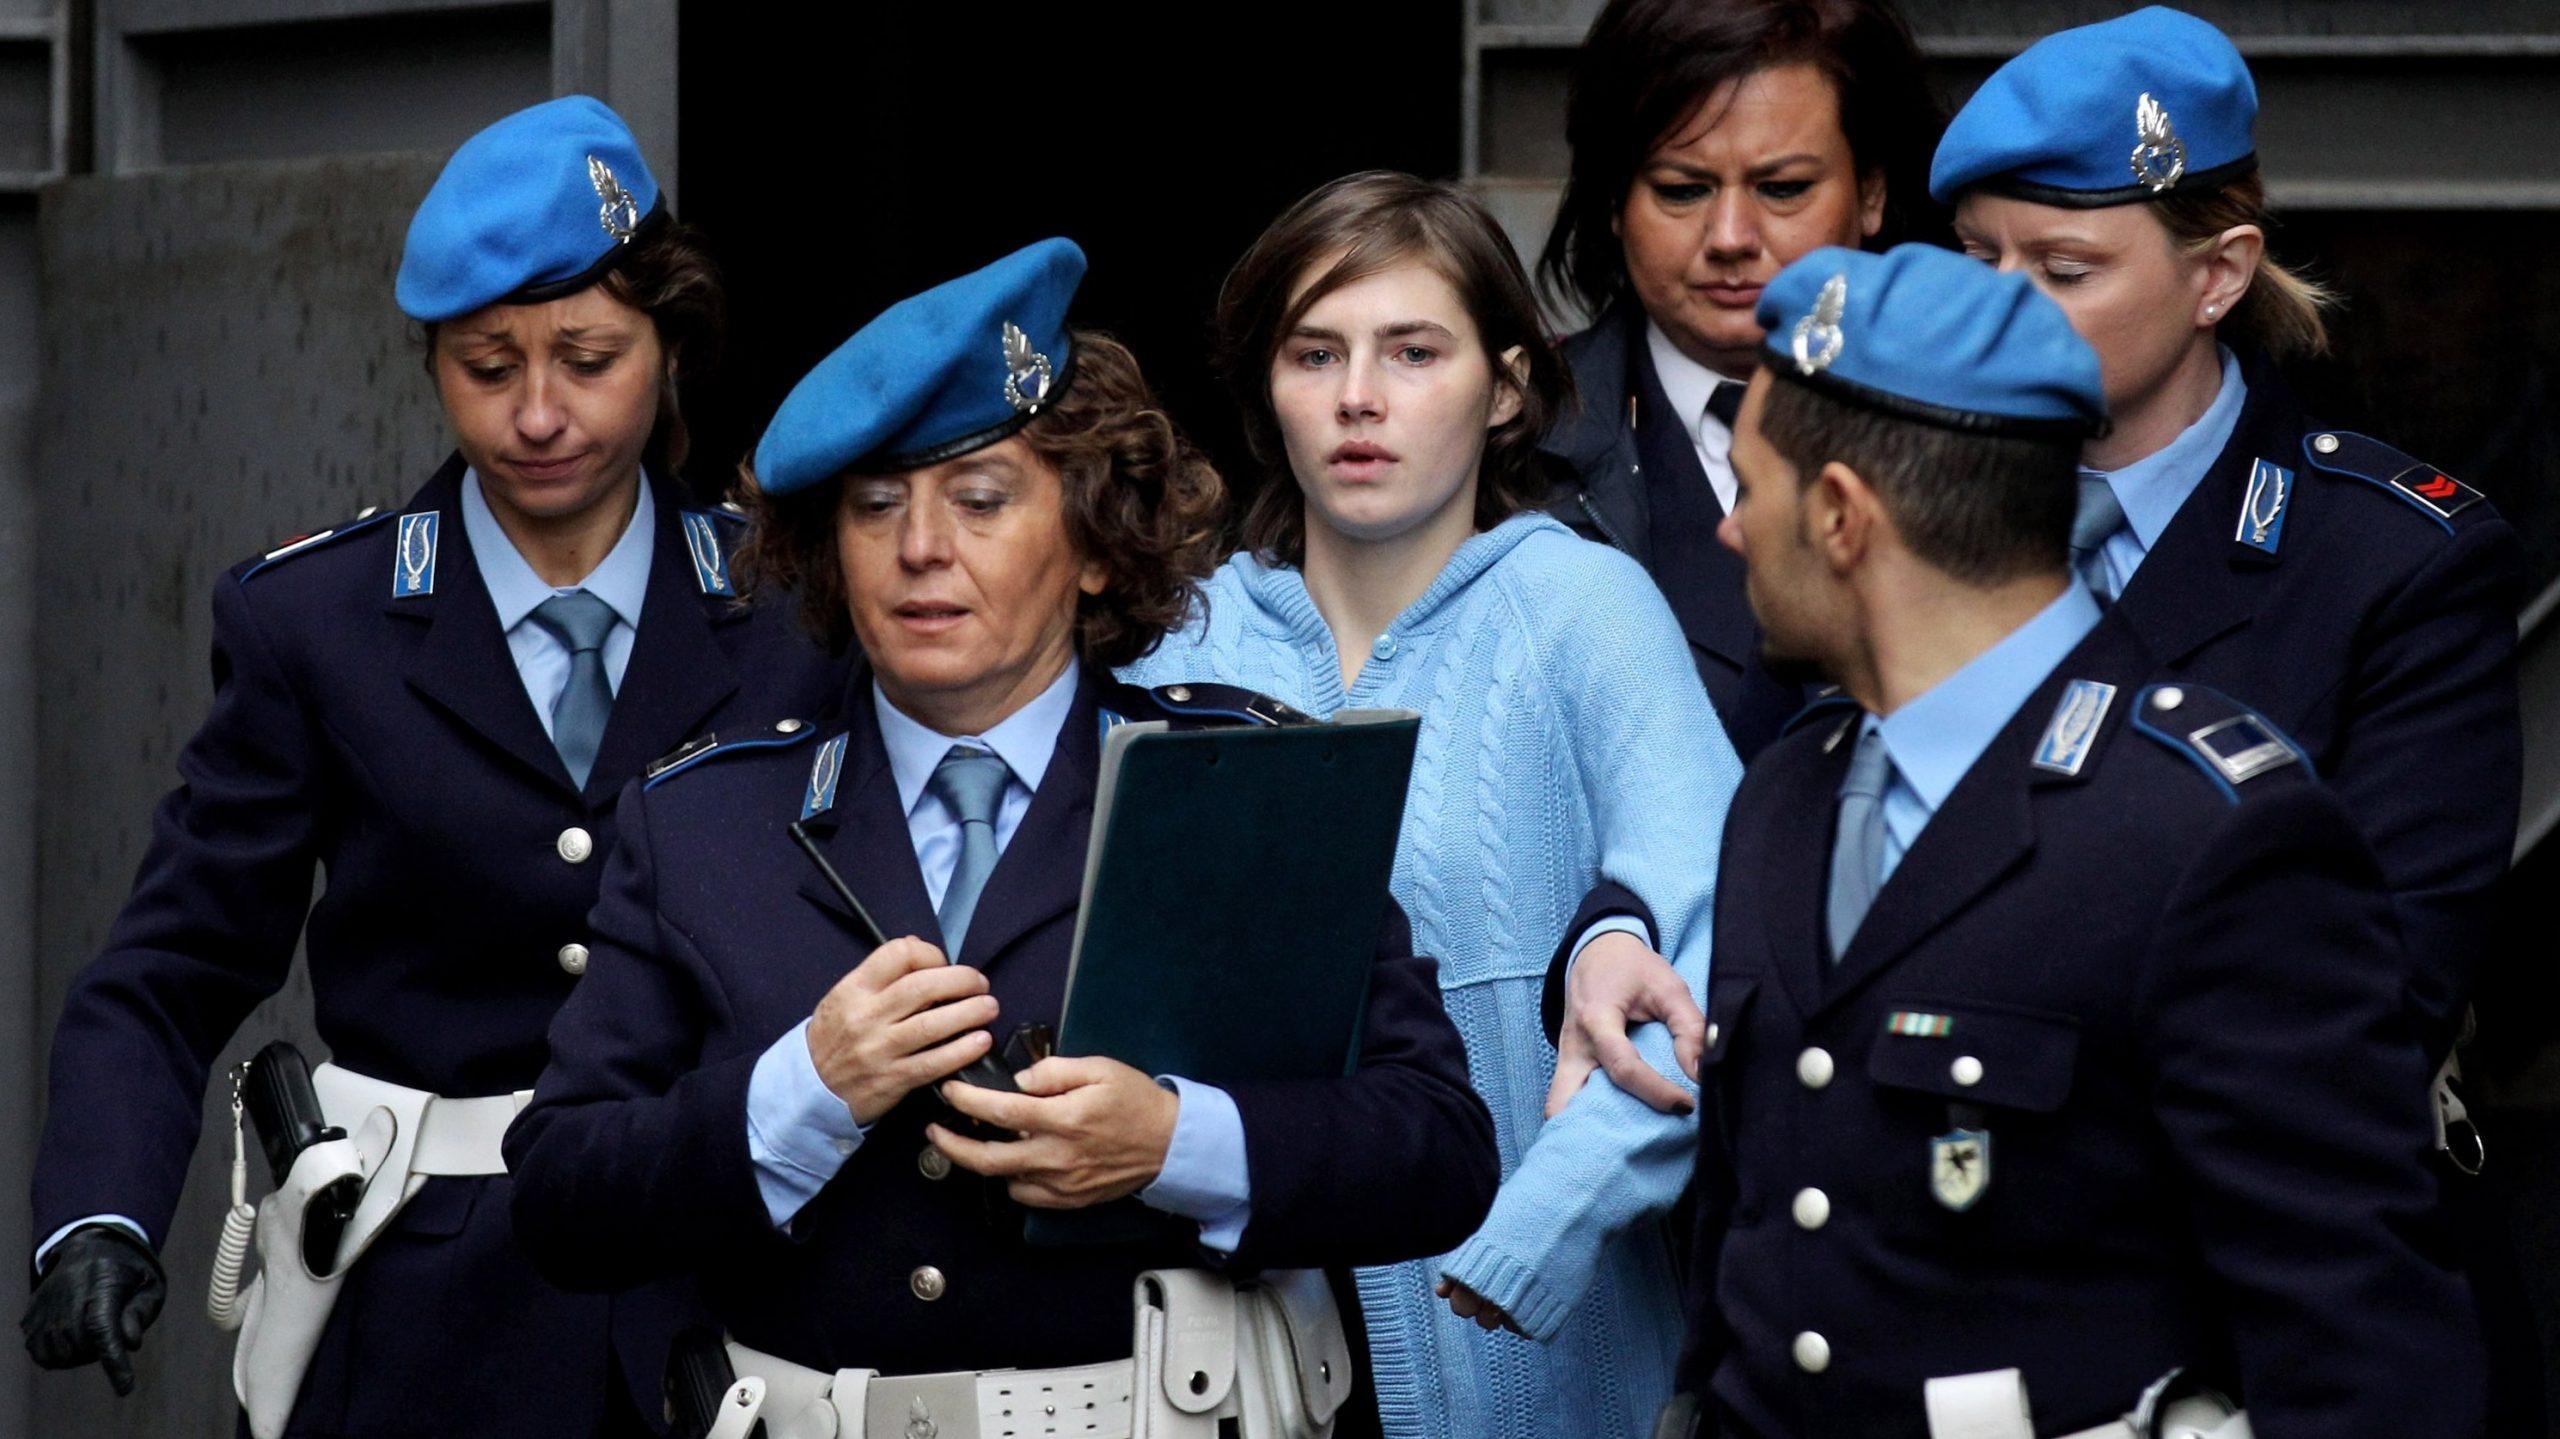 Pengadilan Italia Dimanfaatkan Mafia